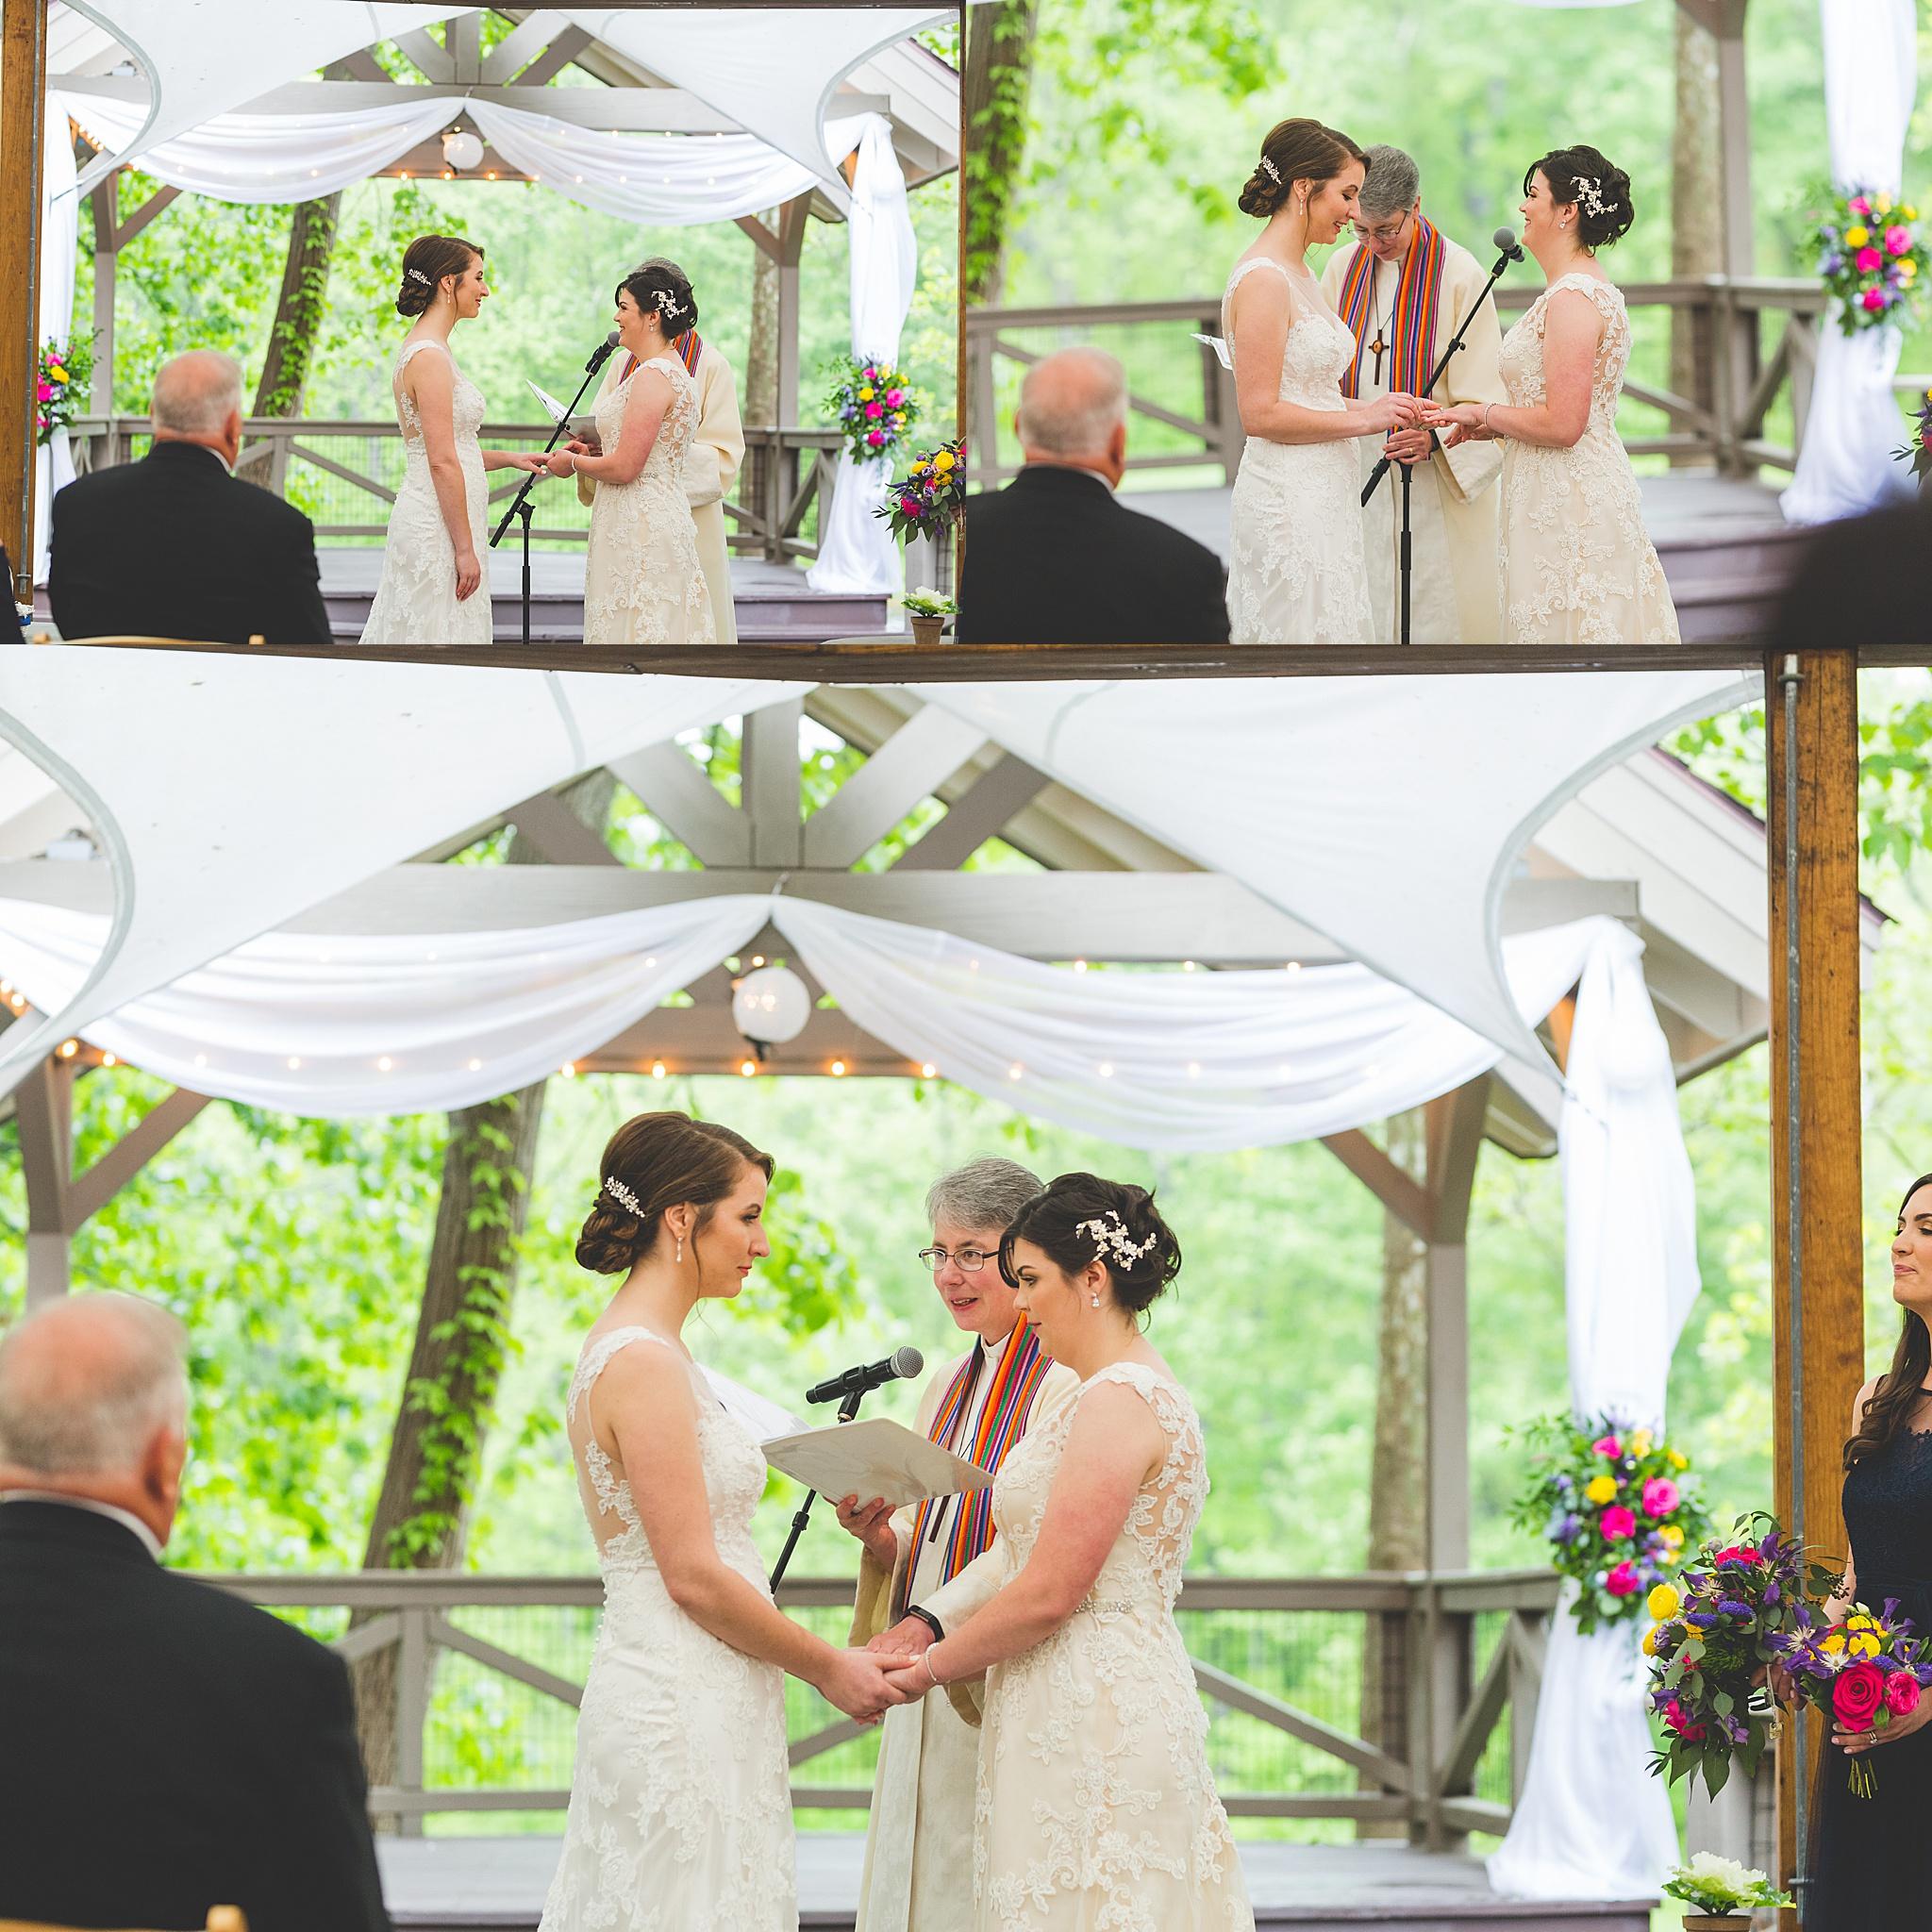 Albany_Wedding_Photographer_7374.jpg